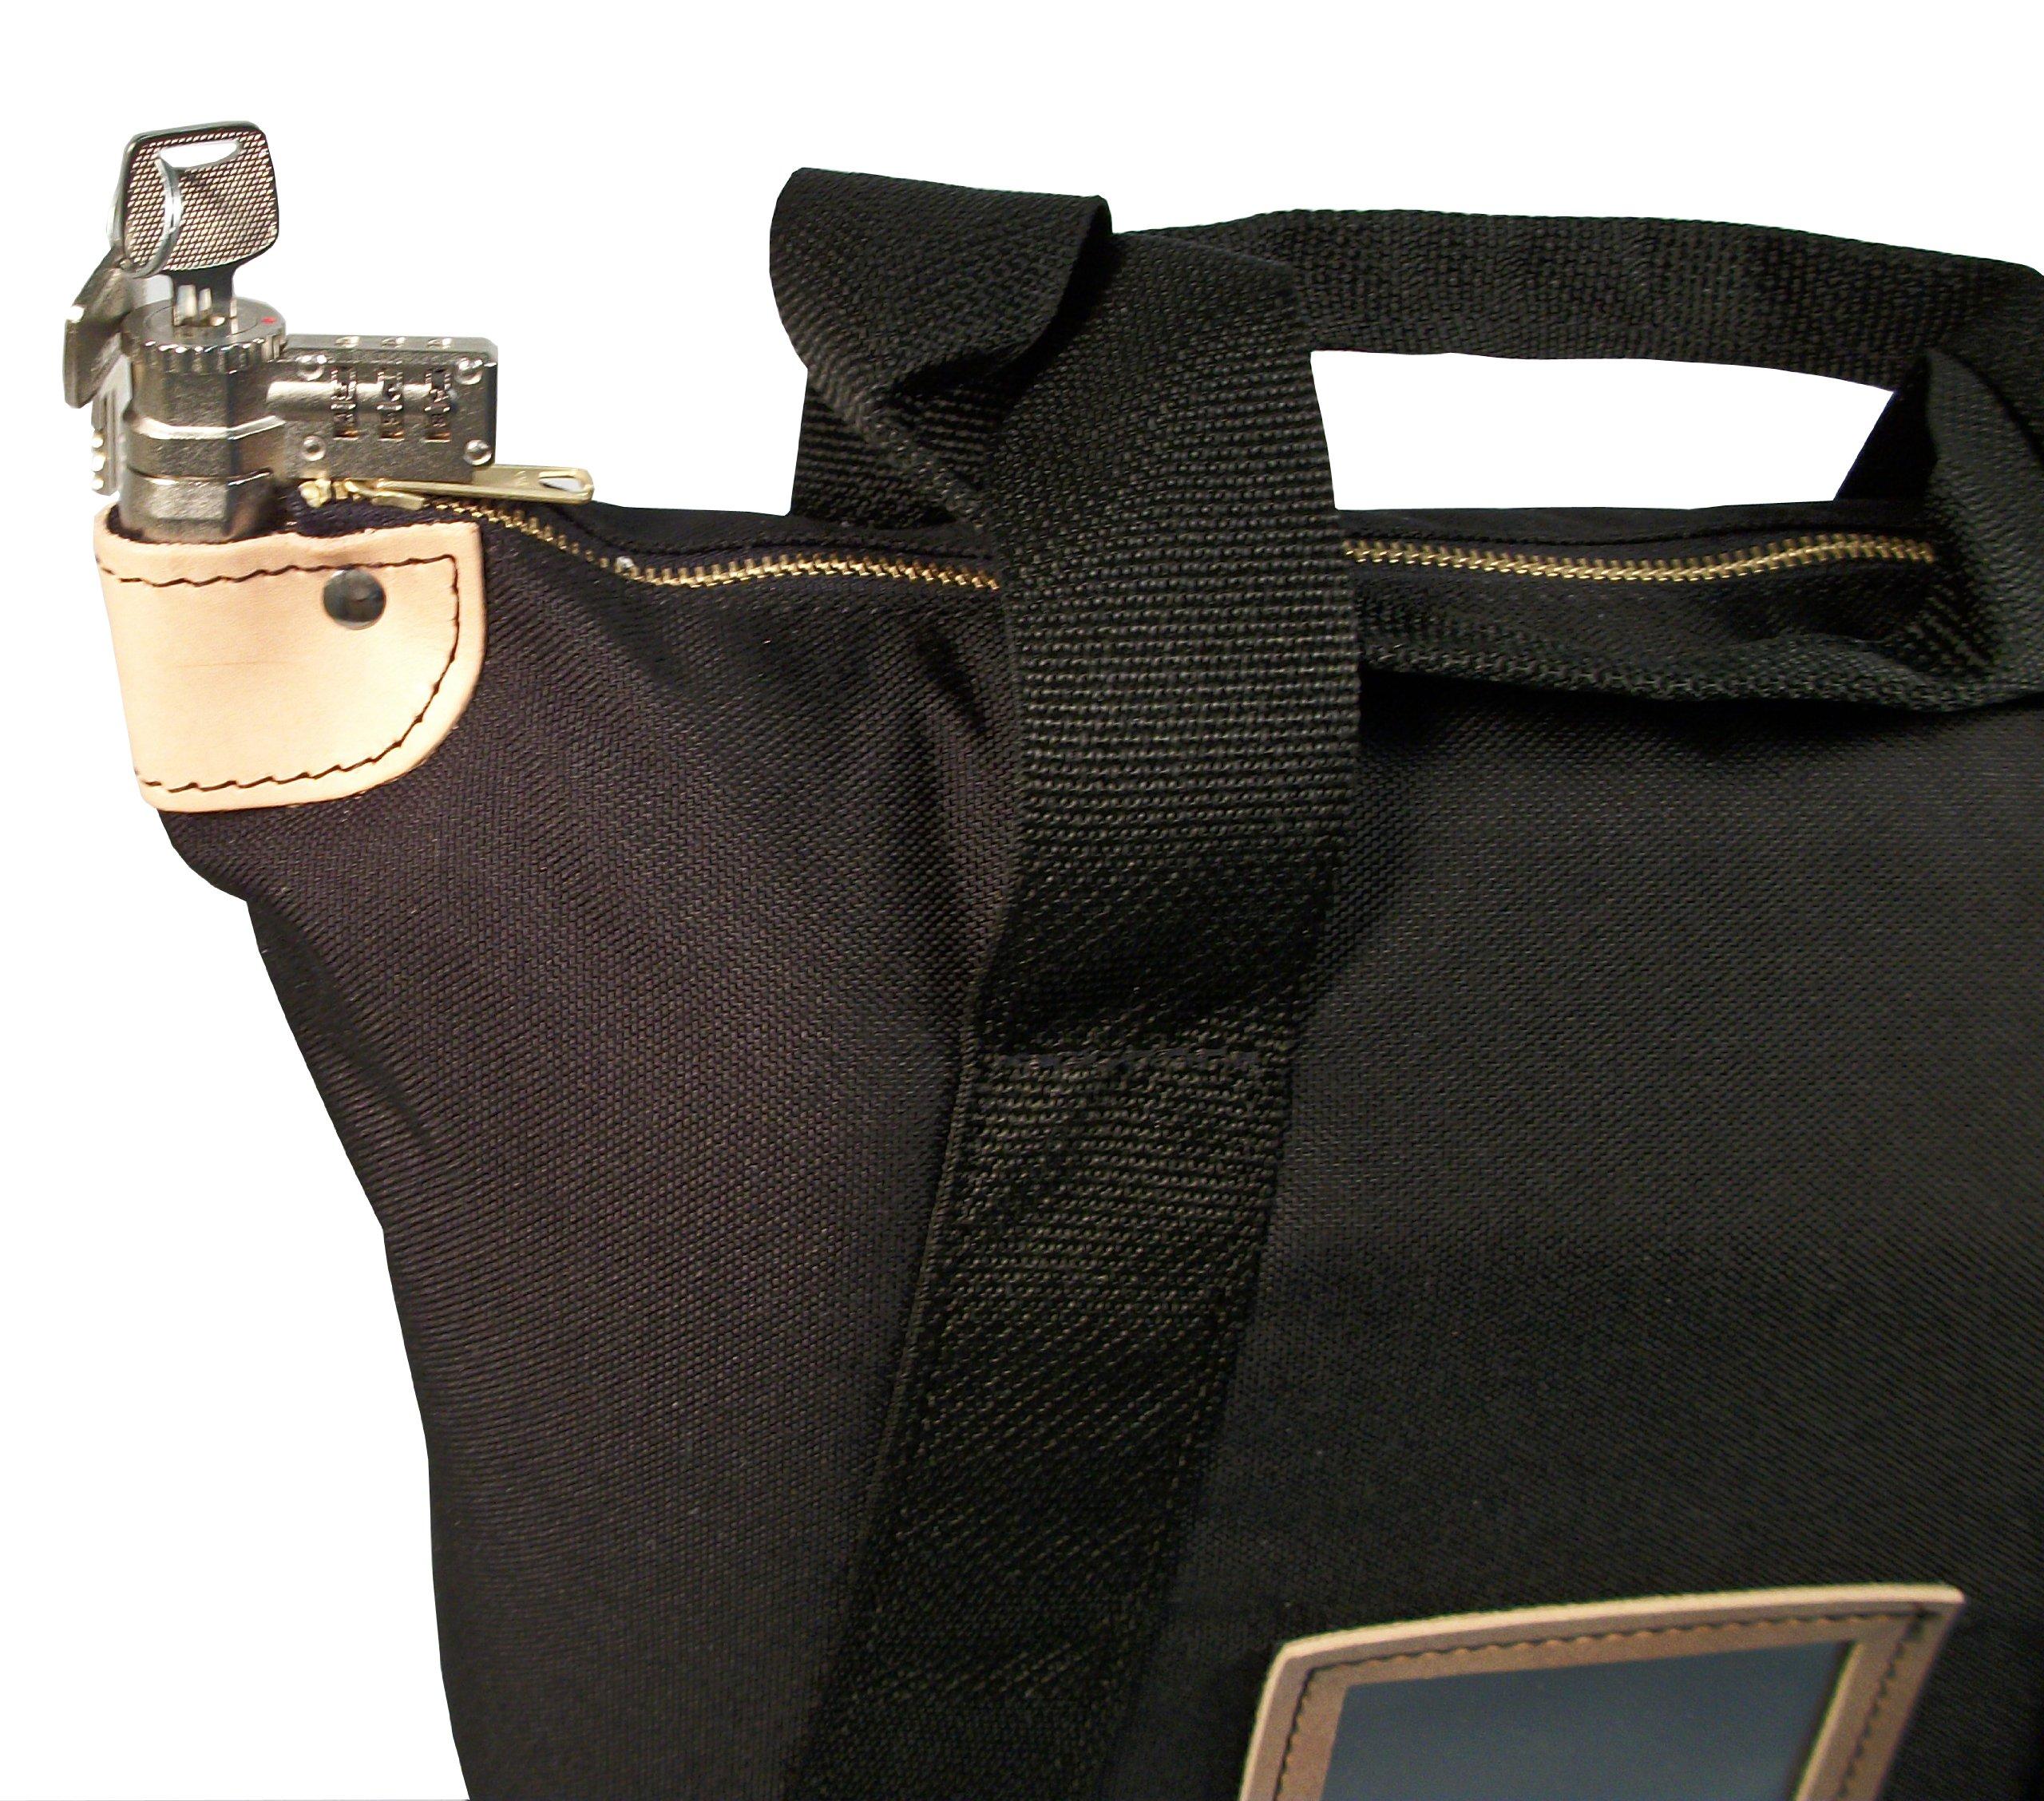 Locking Courier Bag 1000 Denier Nylon Combination Lock Black by Cardinal Bag Supplies (Image #2)